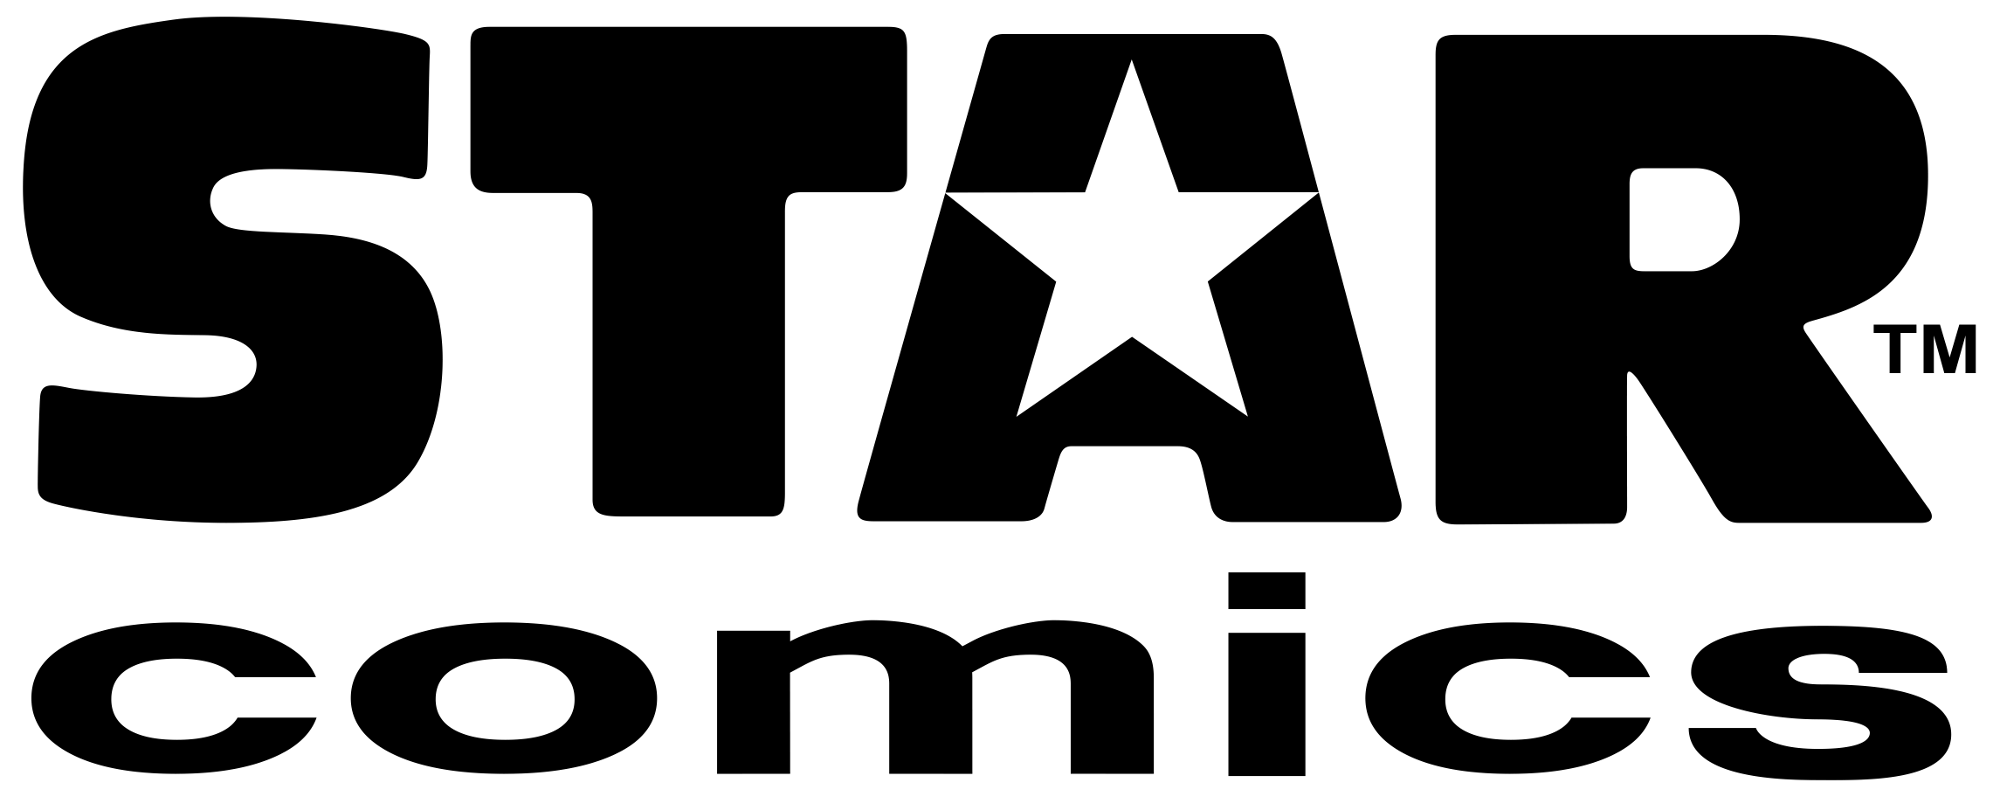 File:Star Comics logo.png.